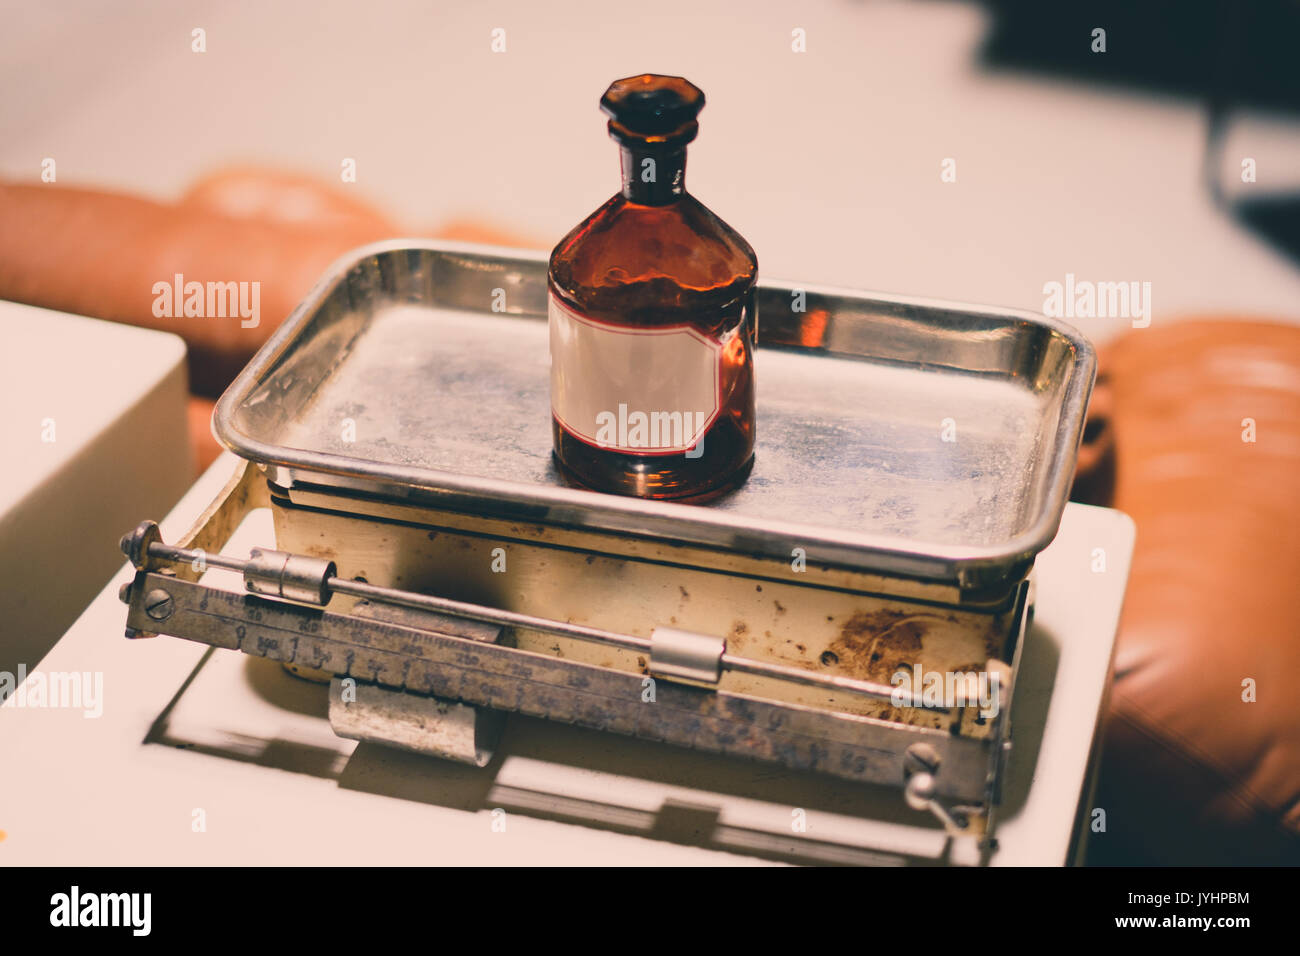 old empty medicine bottle on scale - vintage look - Stock Image